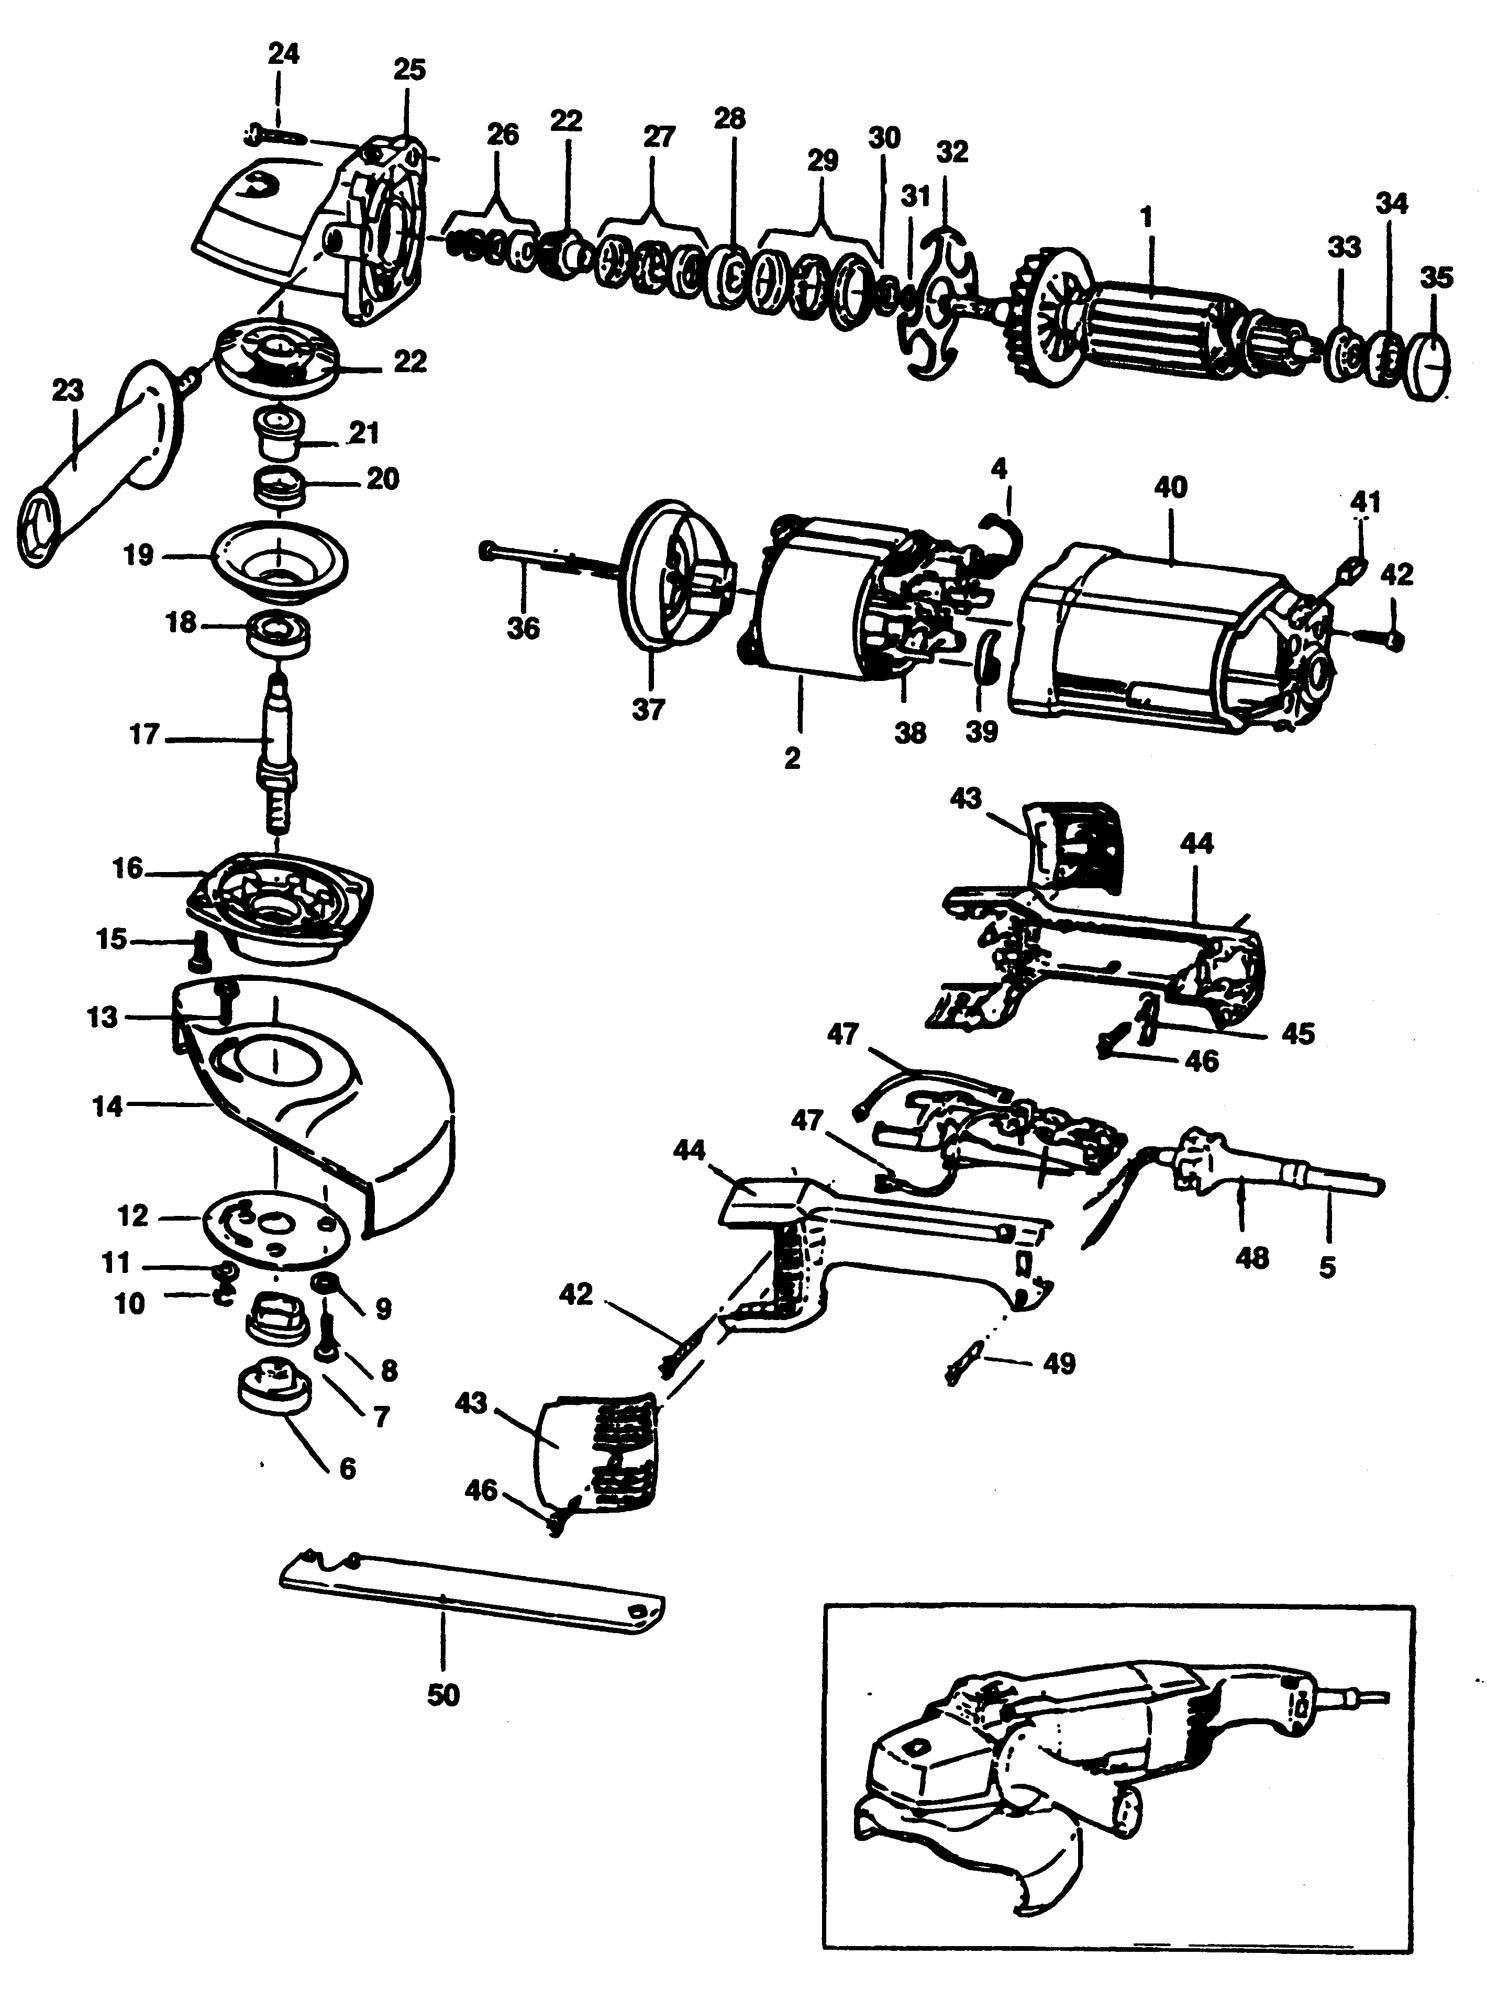 Spares for Black & Decker P5751 Angle Grinder (type 1